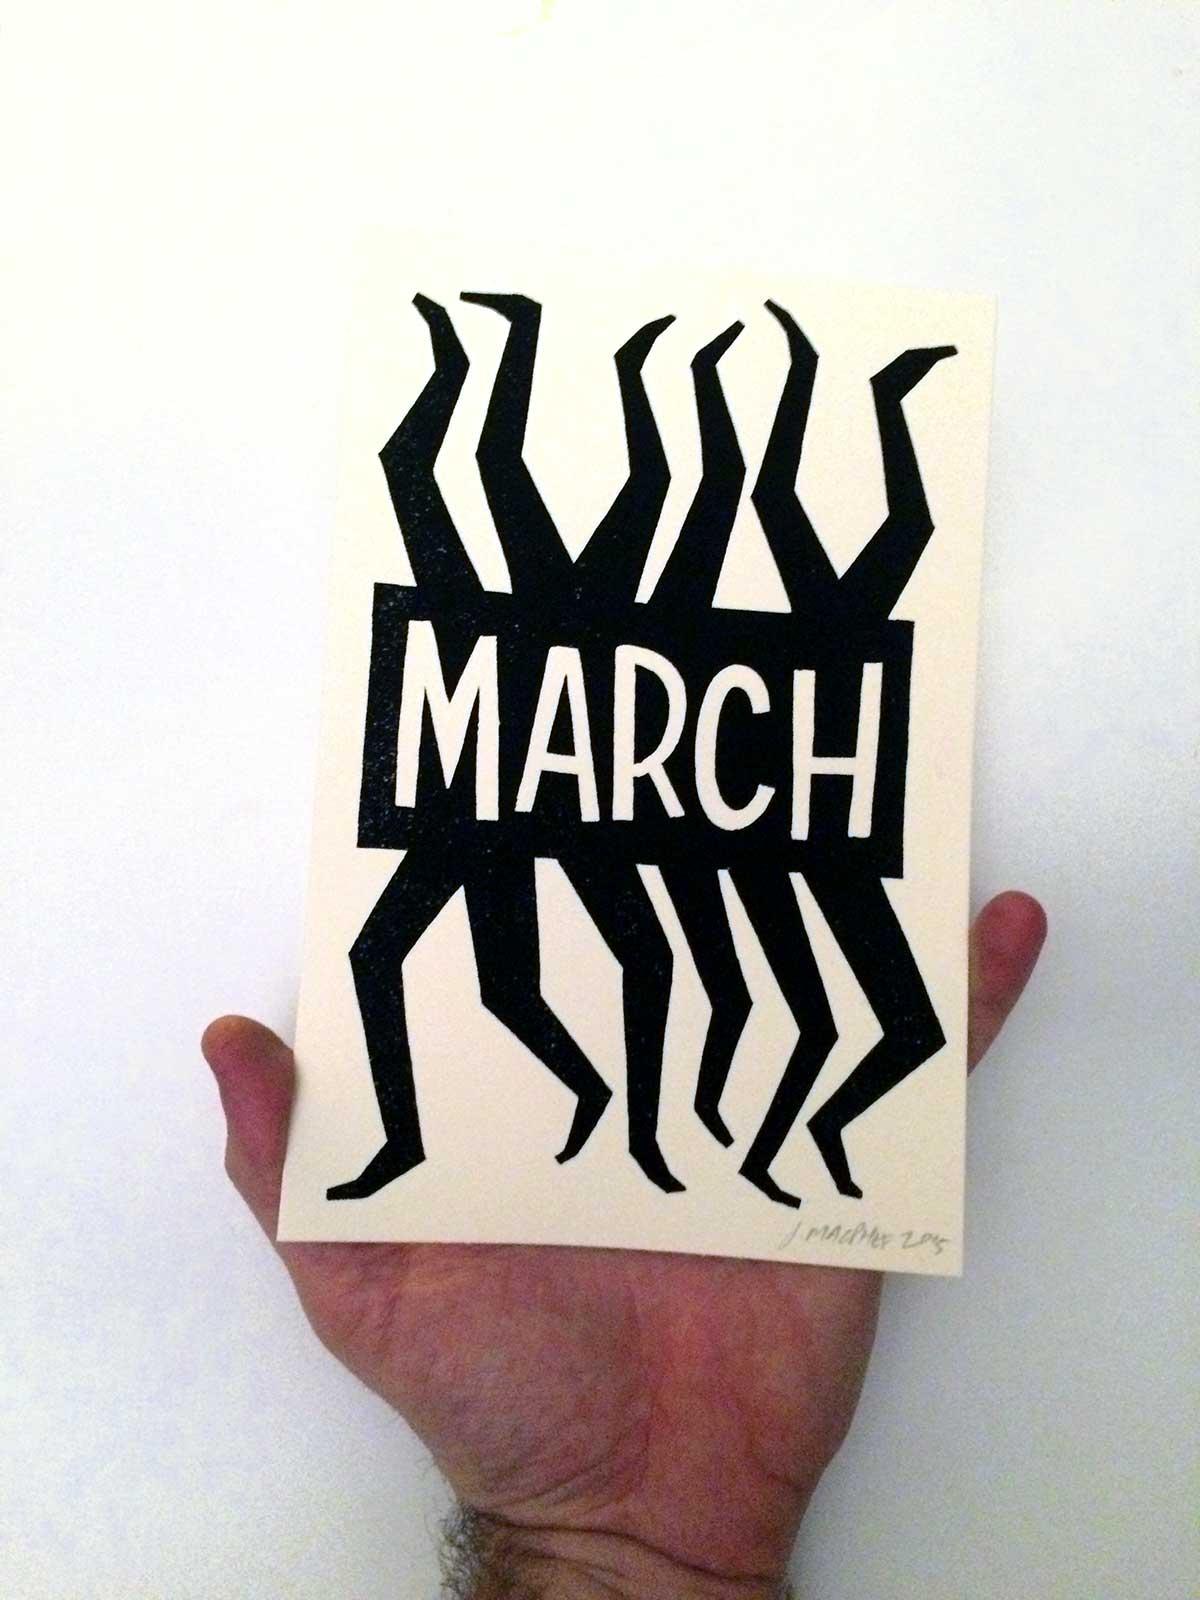 MacPhee_MarchBig02